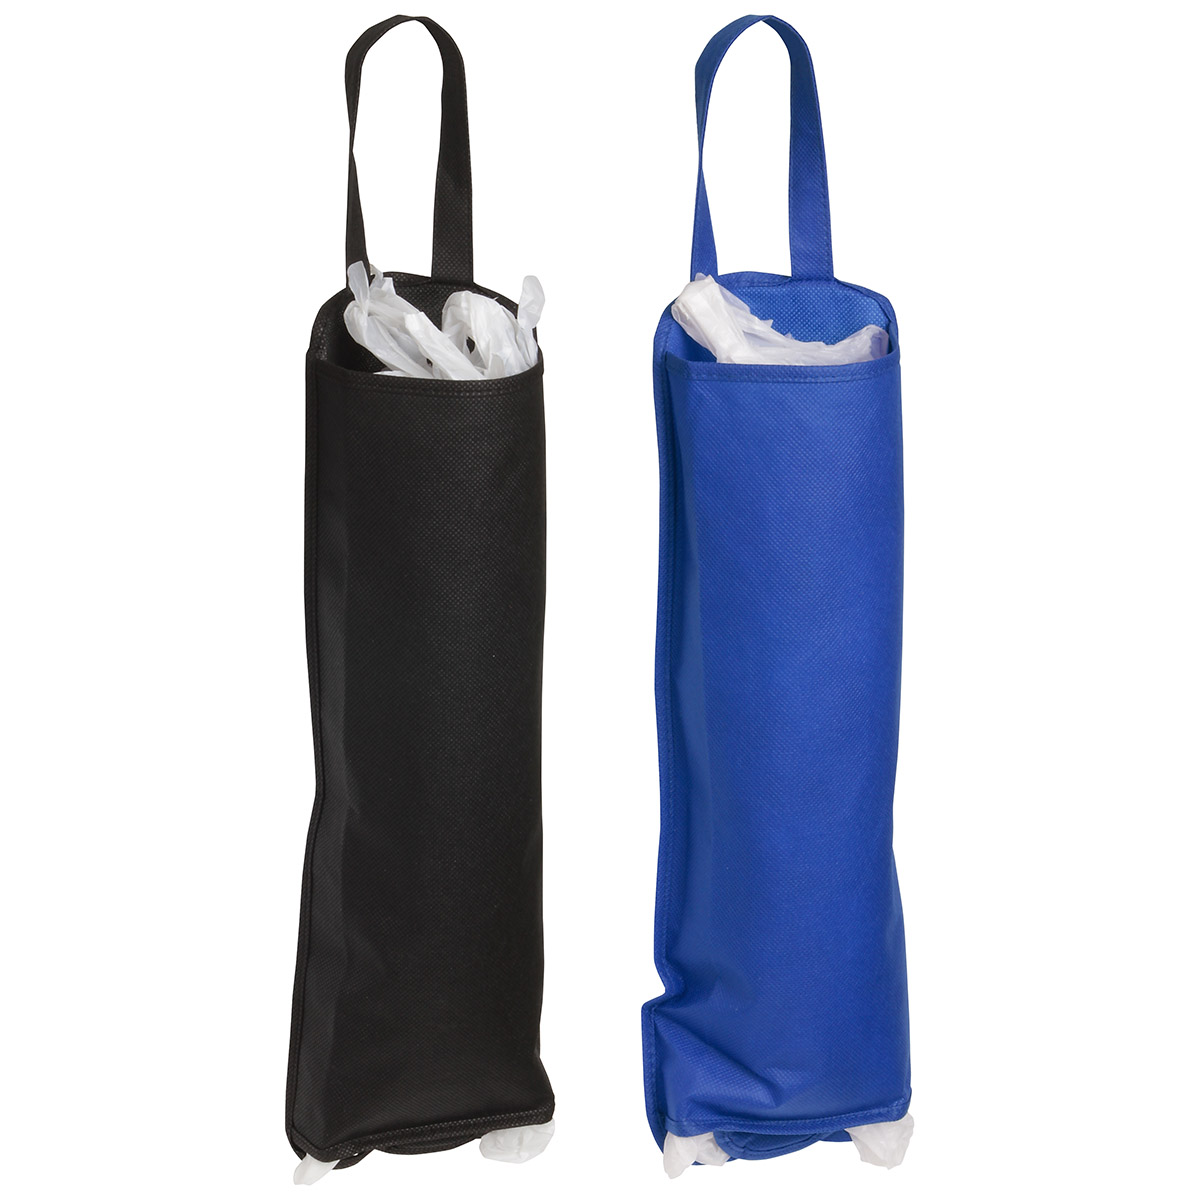 Plastic bag keeper - View Larger Image Download Hi Res